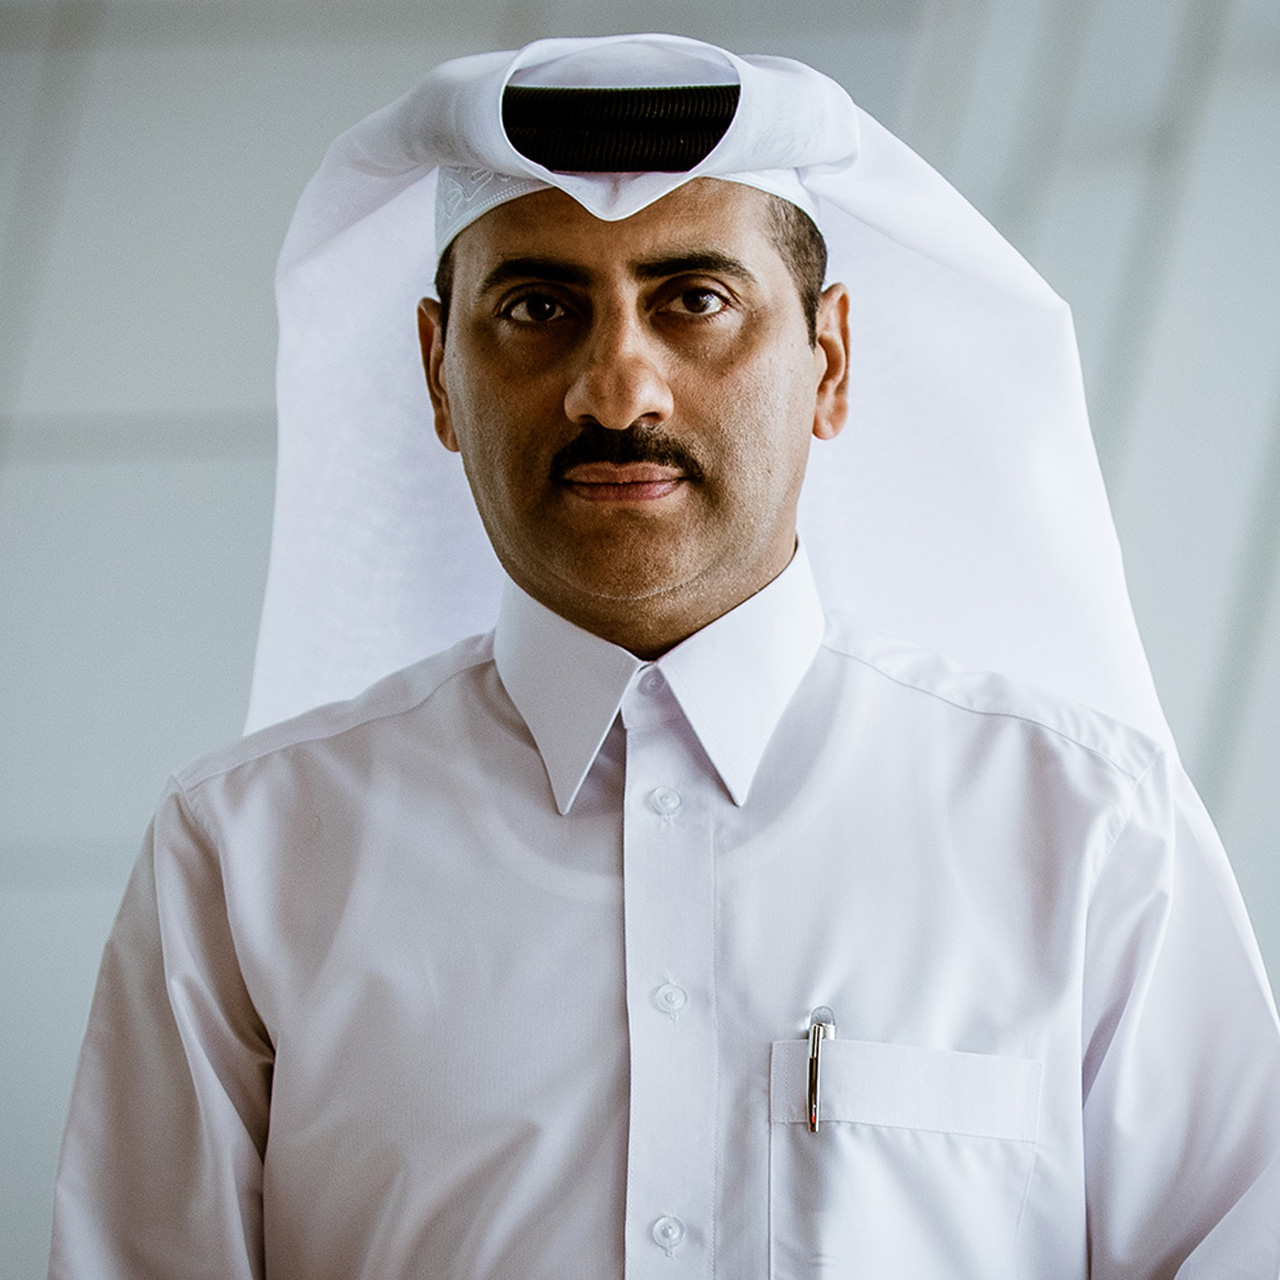 Yosouf Al-Salehi